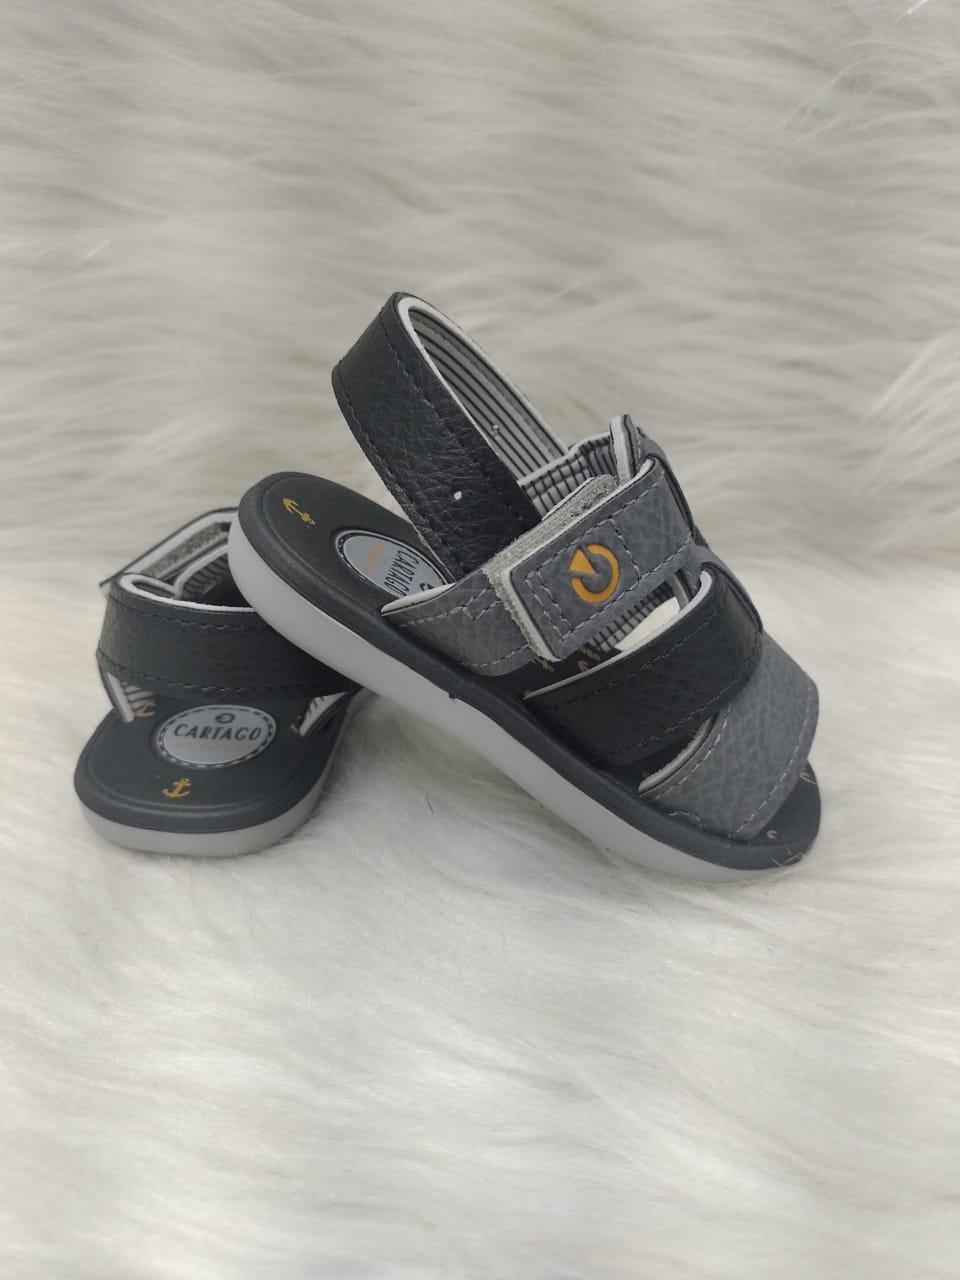 Sandalia Infantil Menino Cartago Linz Ref:11630